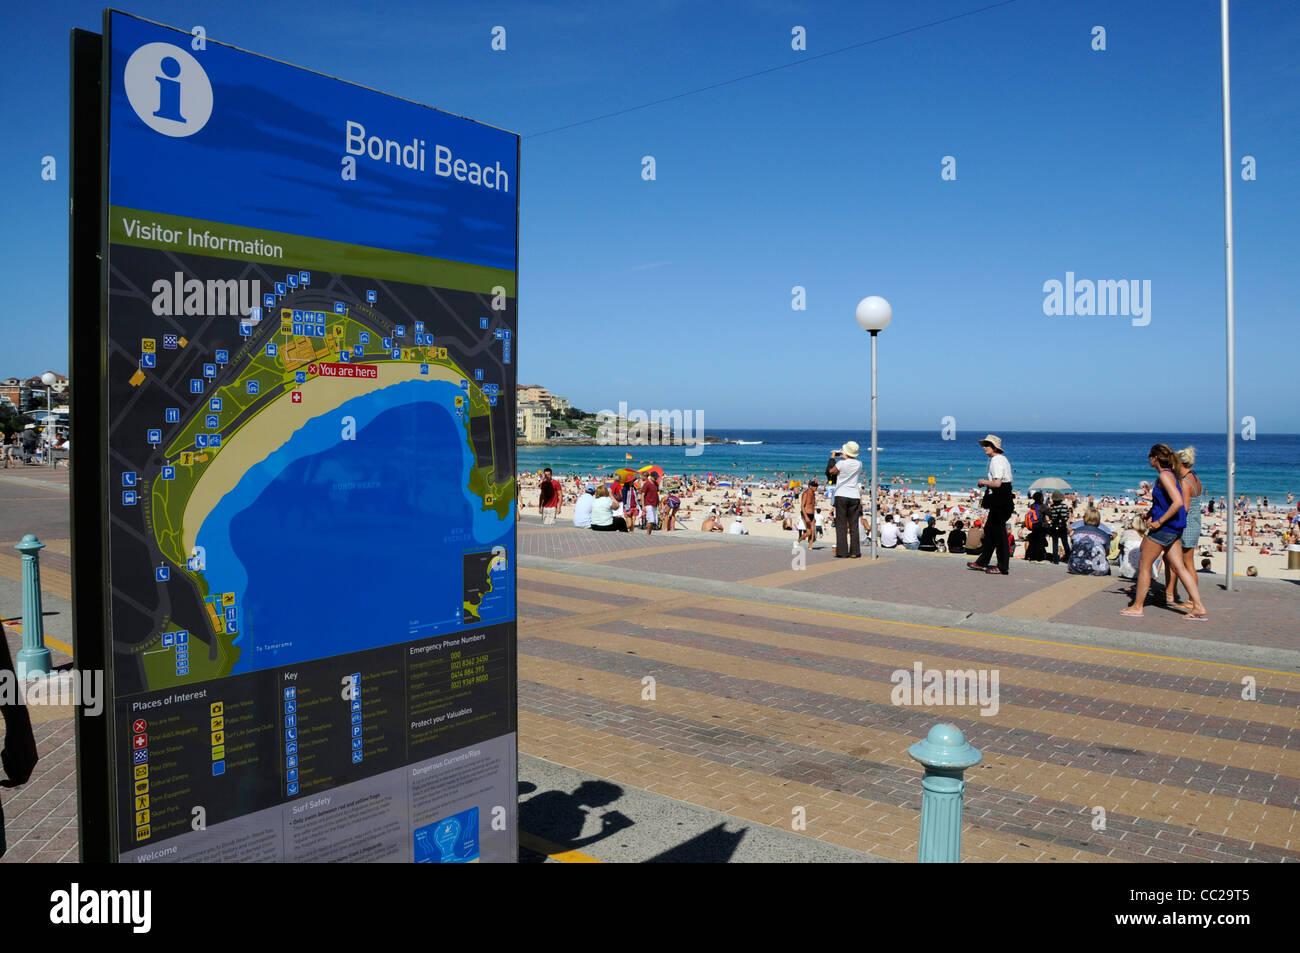 A Bondi Beach map sign at Bondi Beach near Sydney,New South Wales, Australia - Stock Image